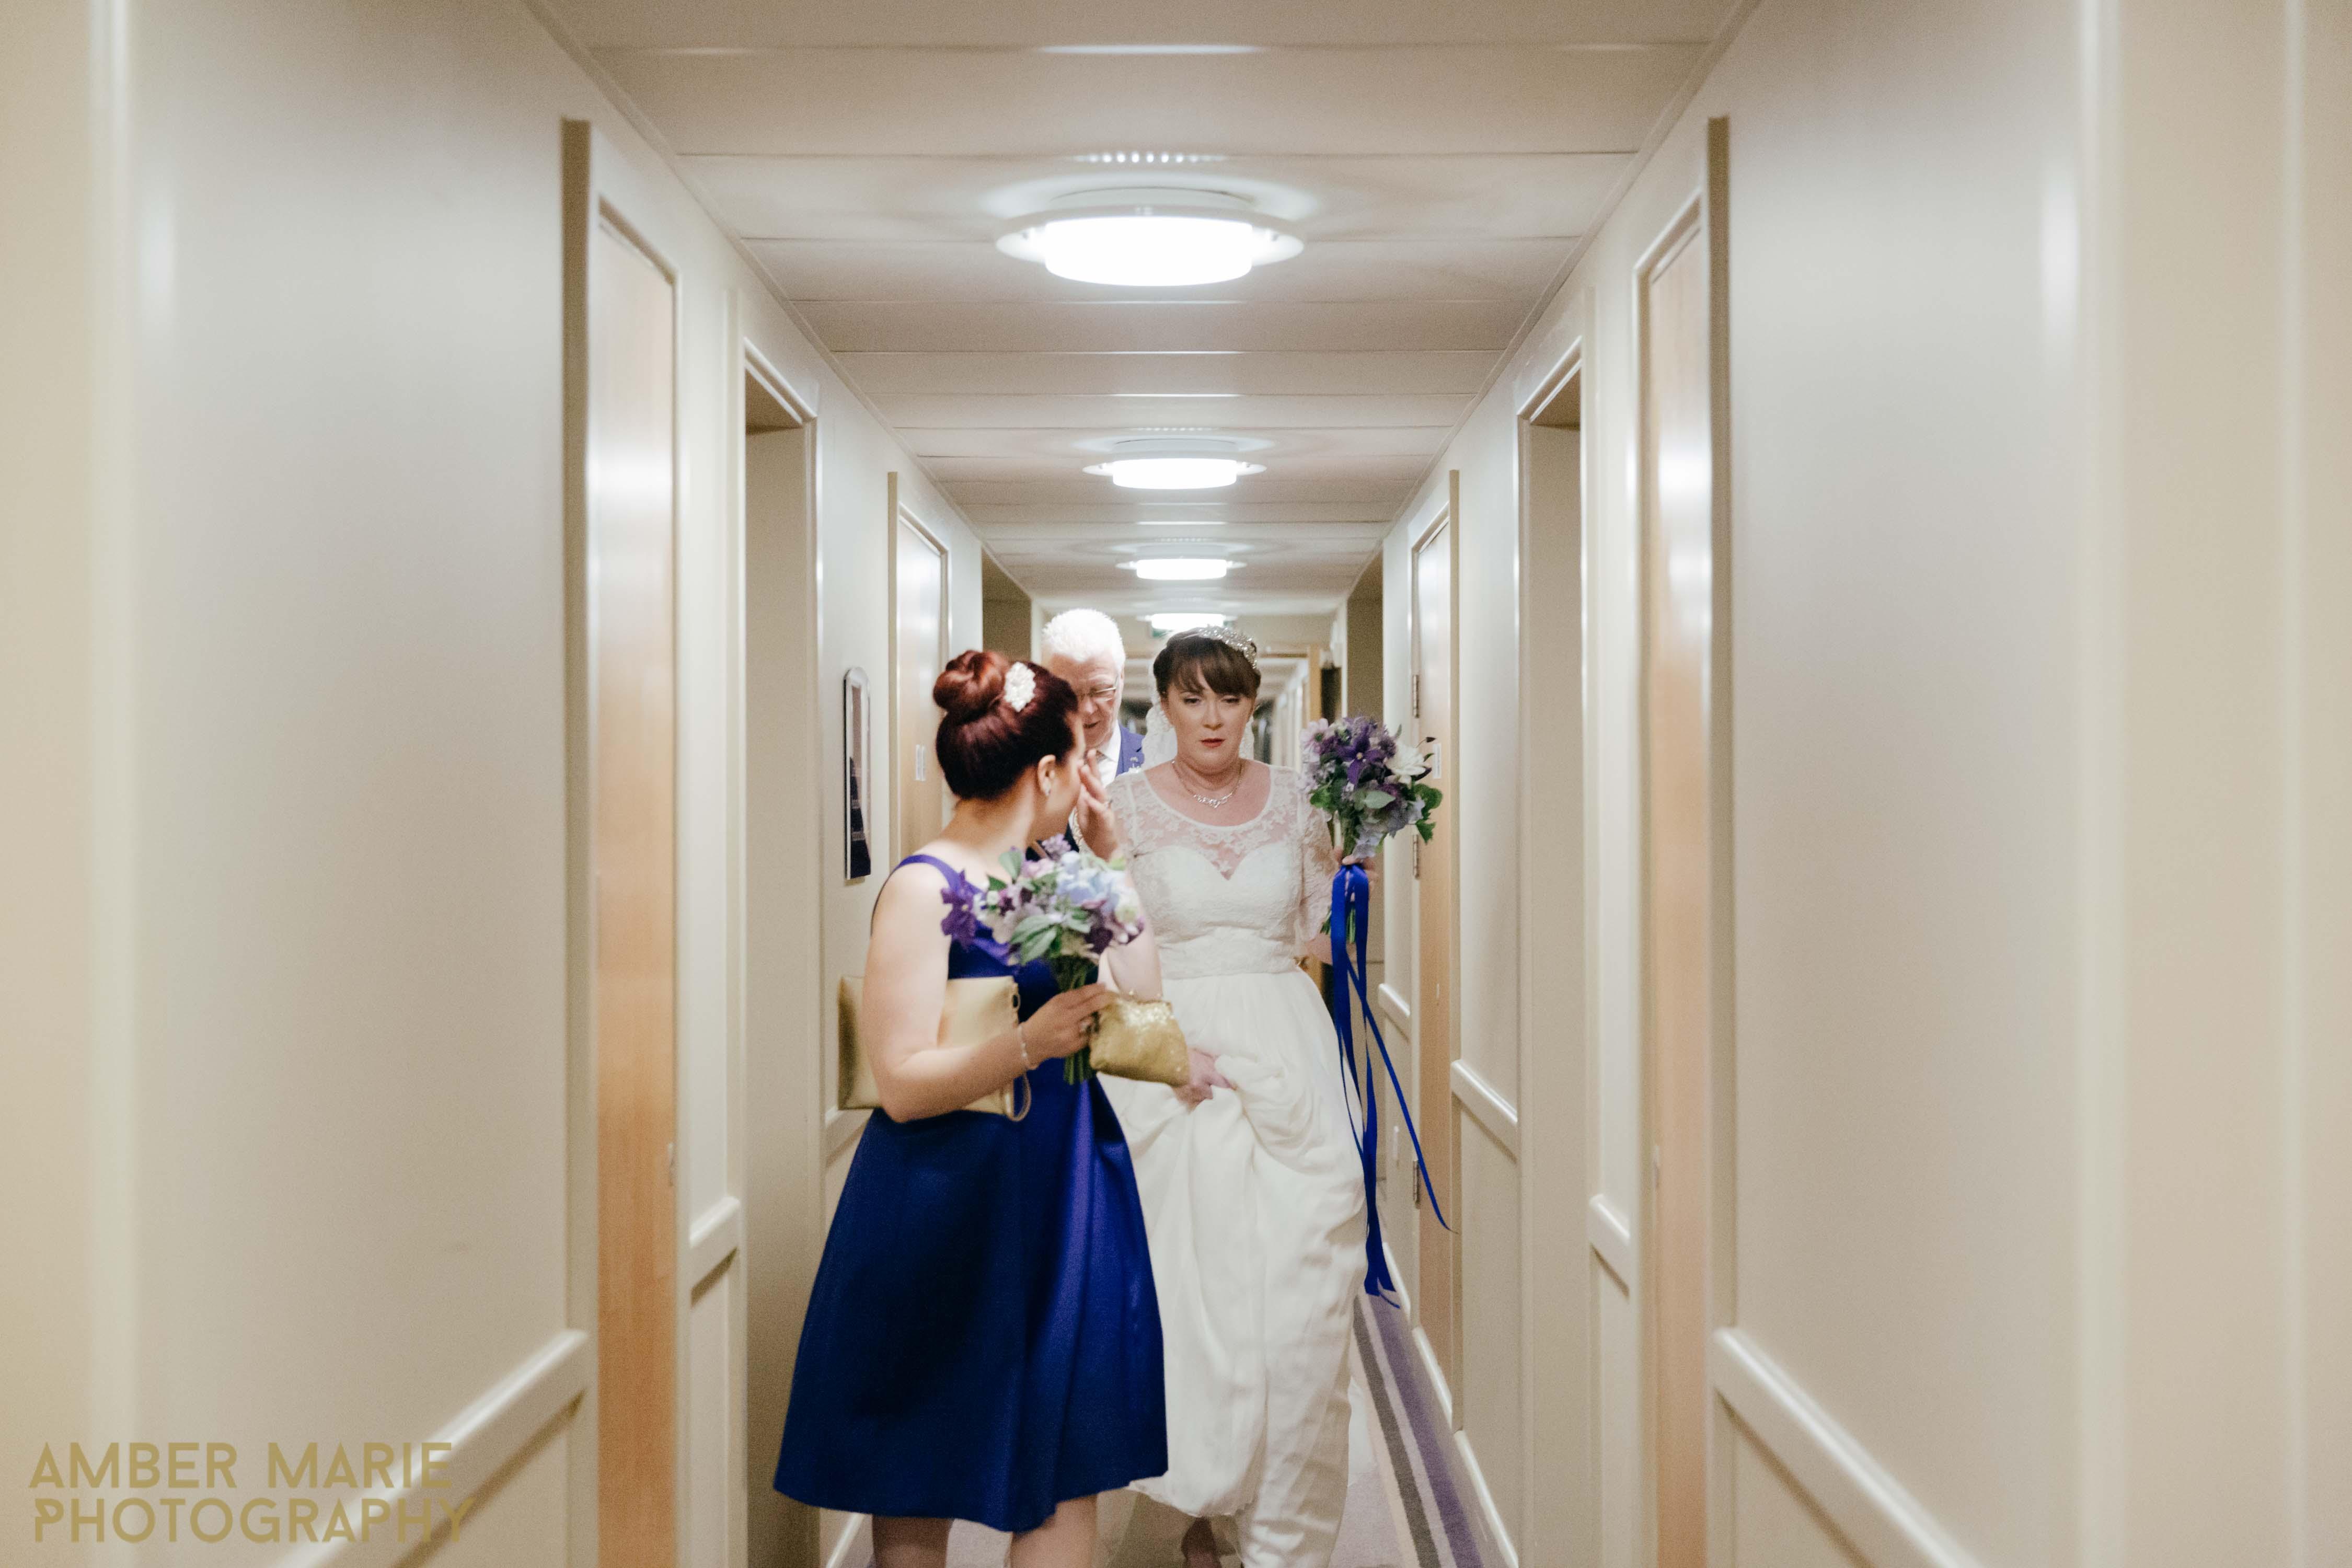 Quirky Creative Wedding Photographers Leeds Yorkshire